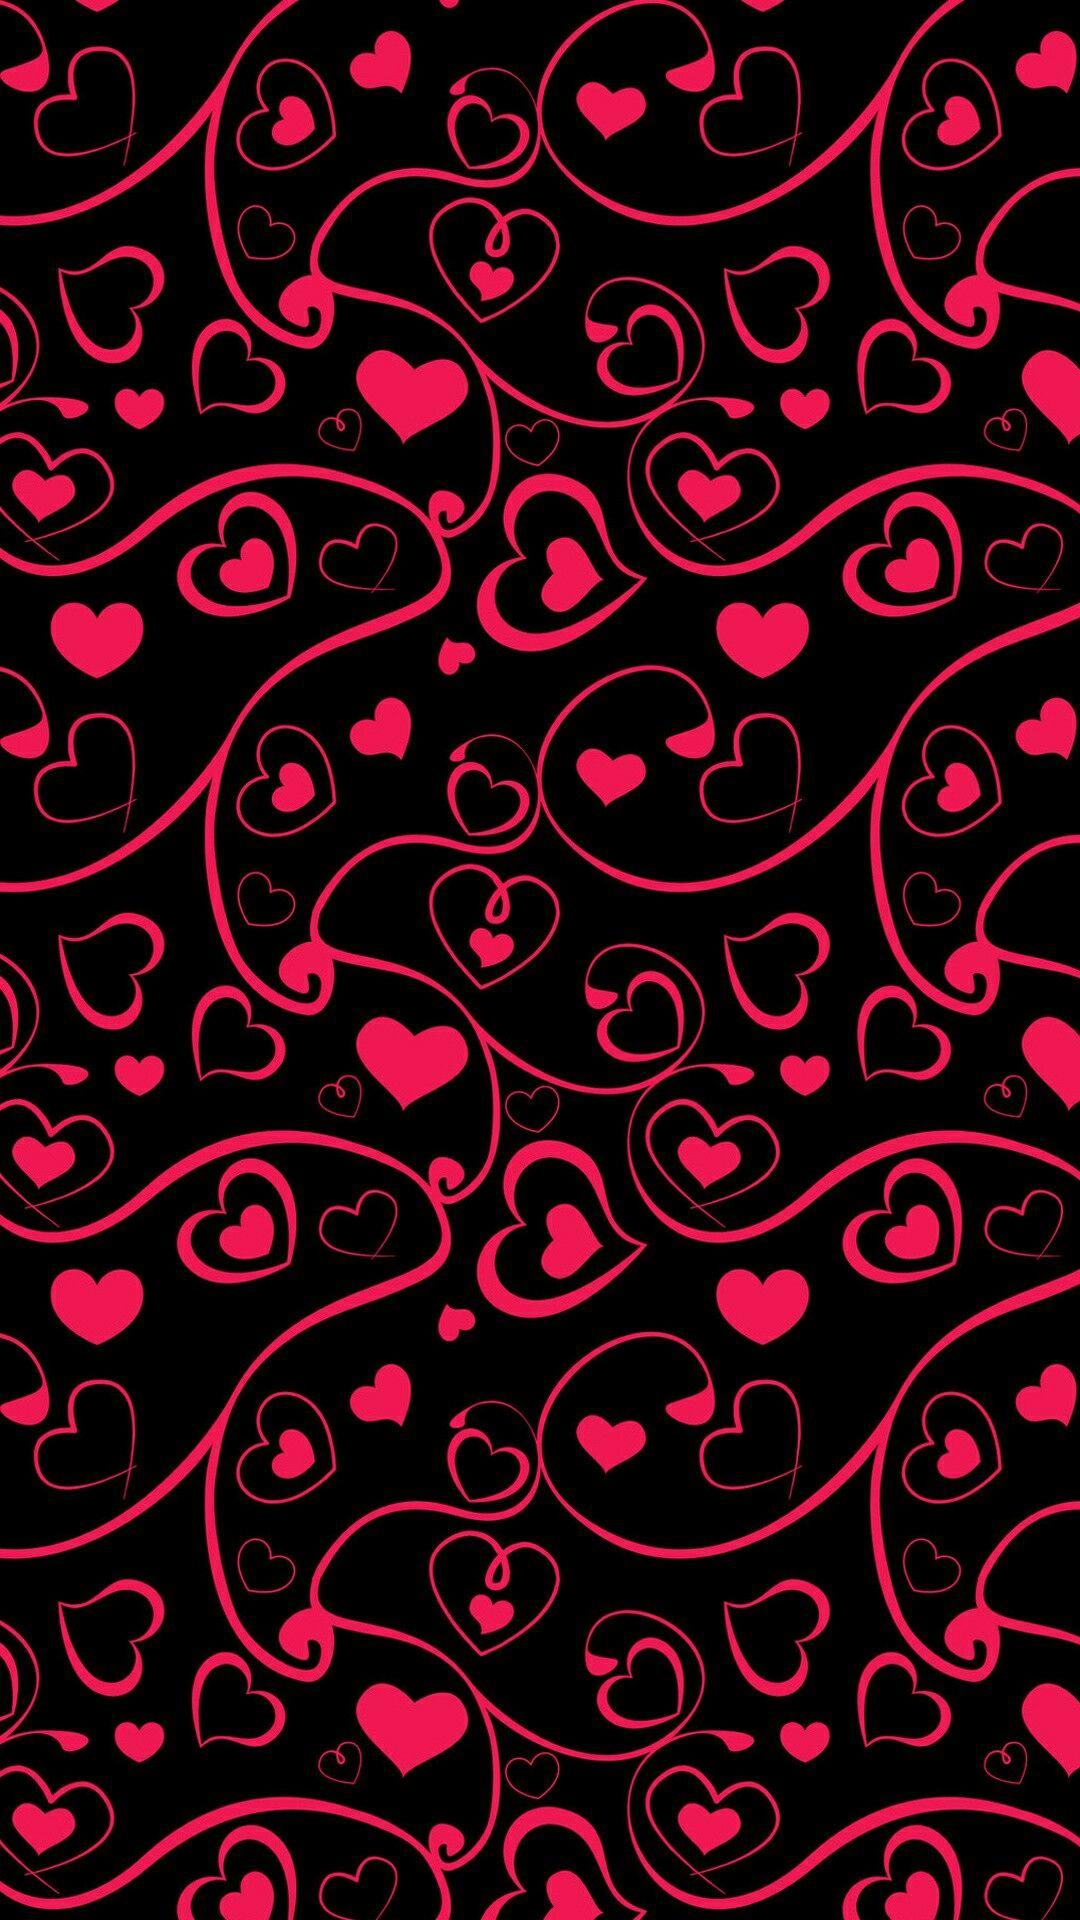 Red Black Hearts Wallpaper Heart Wallpaper Valentines